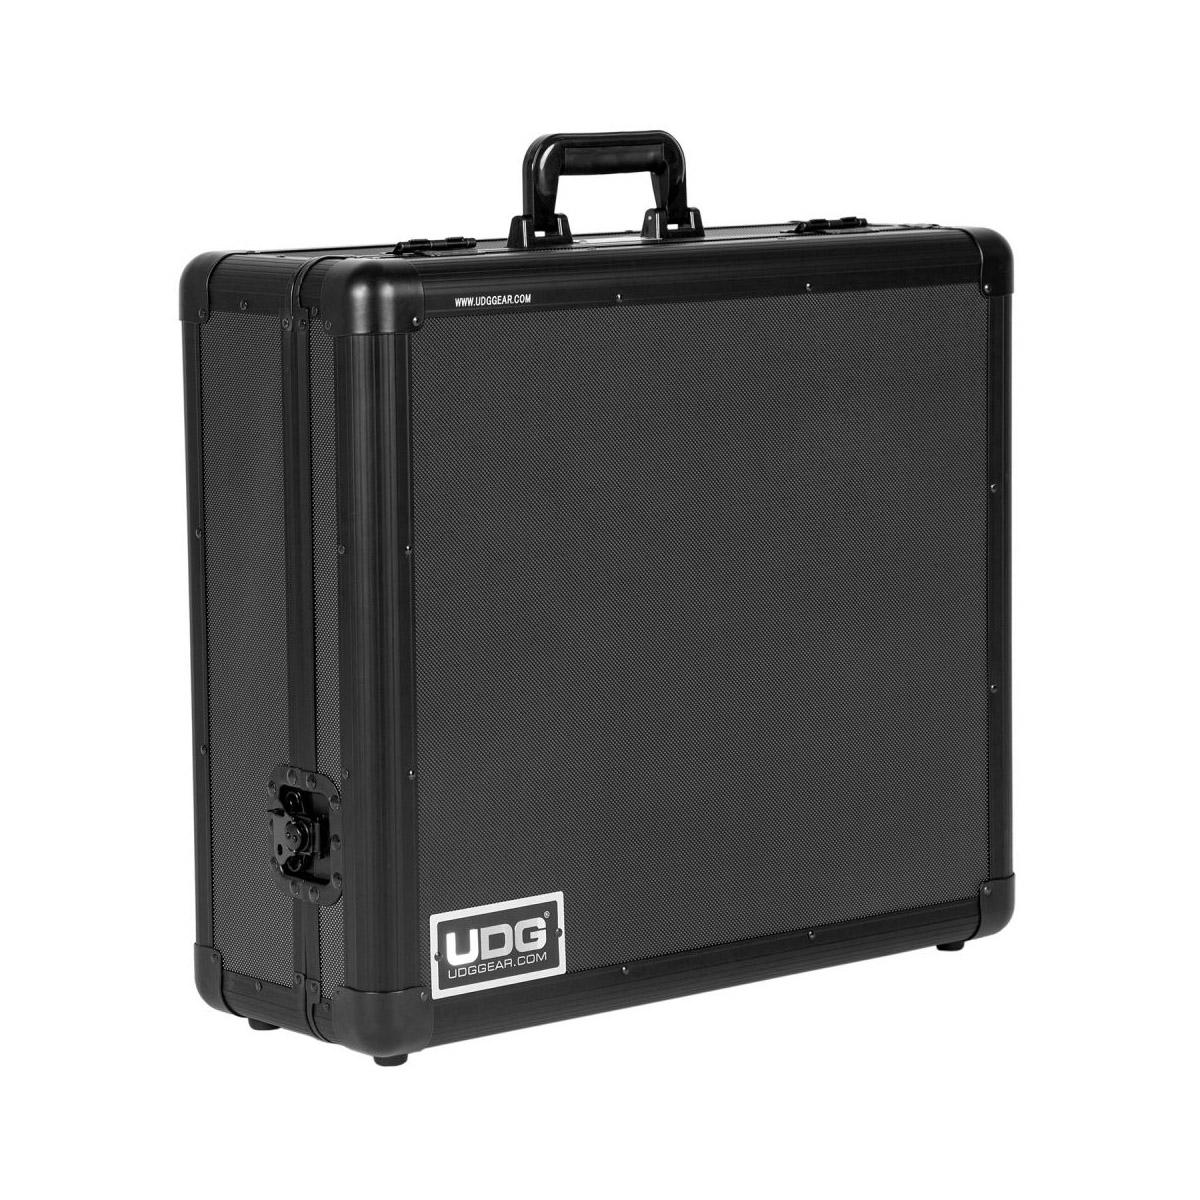 Case para equipamento de DJ  UDG U93012BL